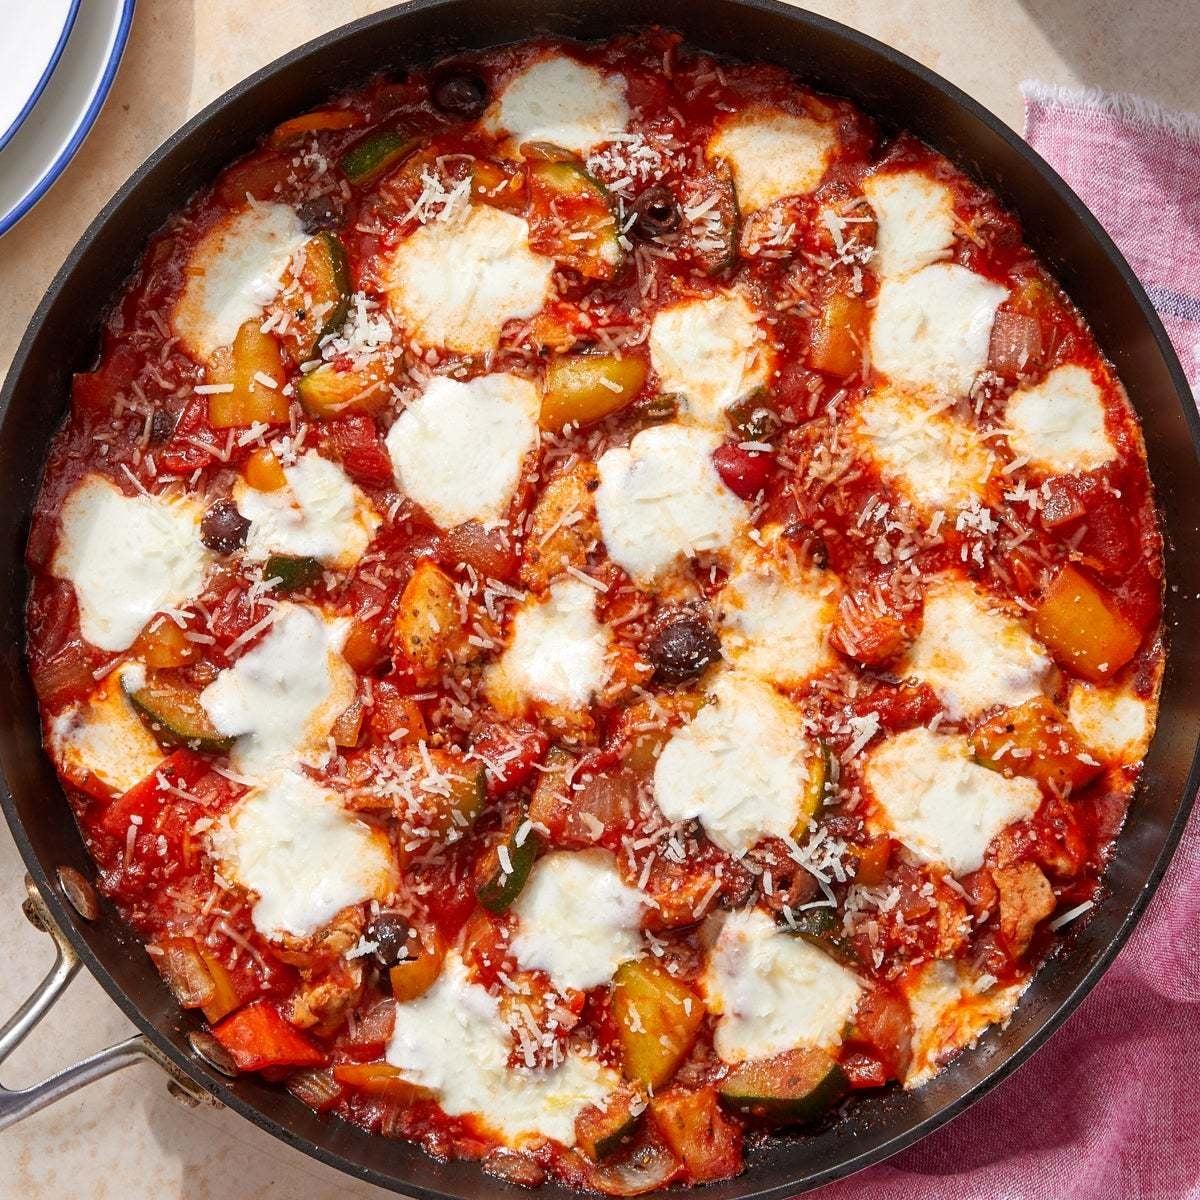 Italian Chicken & Vegetable Skillet with Mozzarella & Grana Padano Cheese